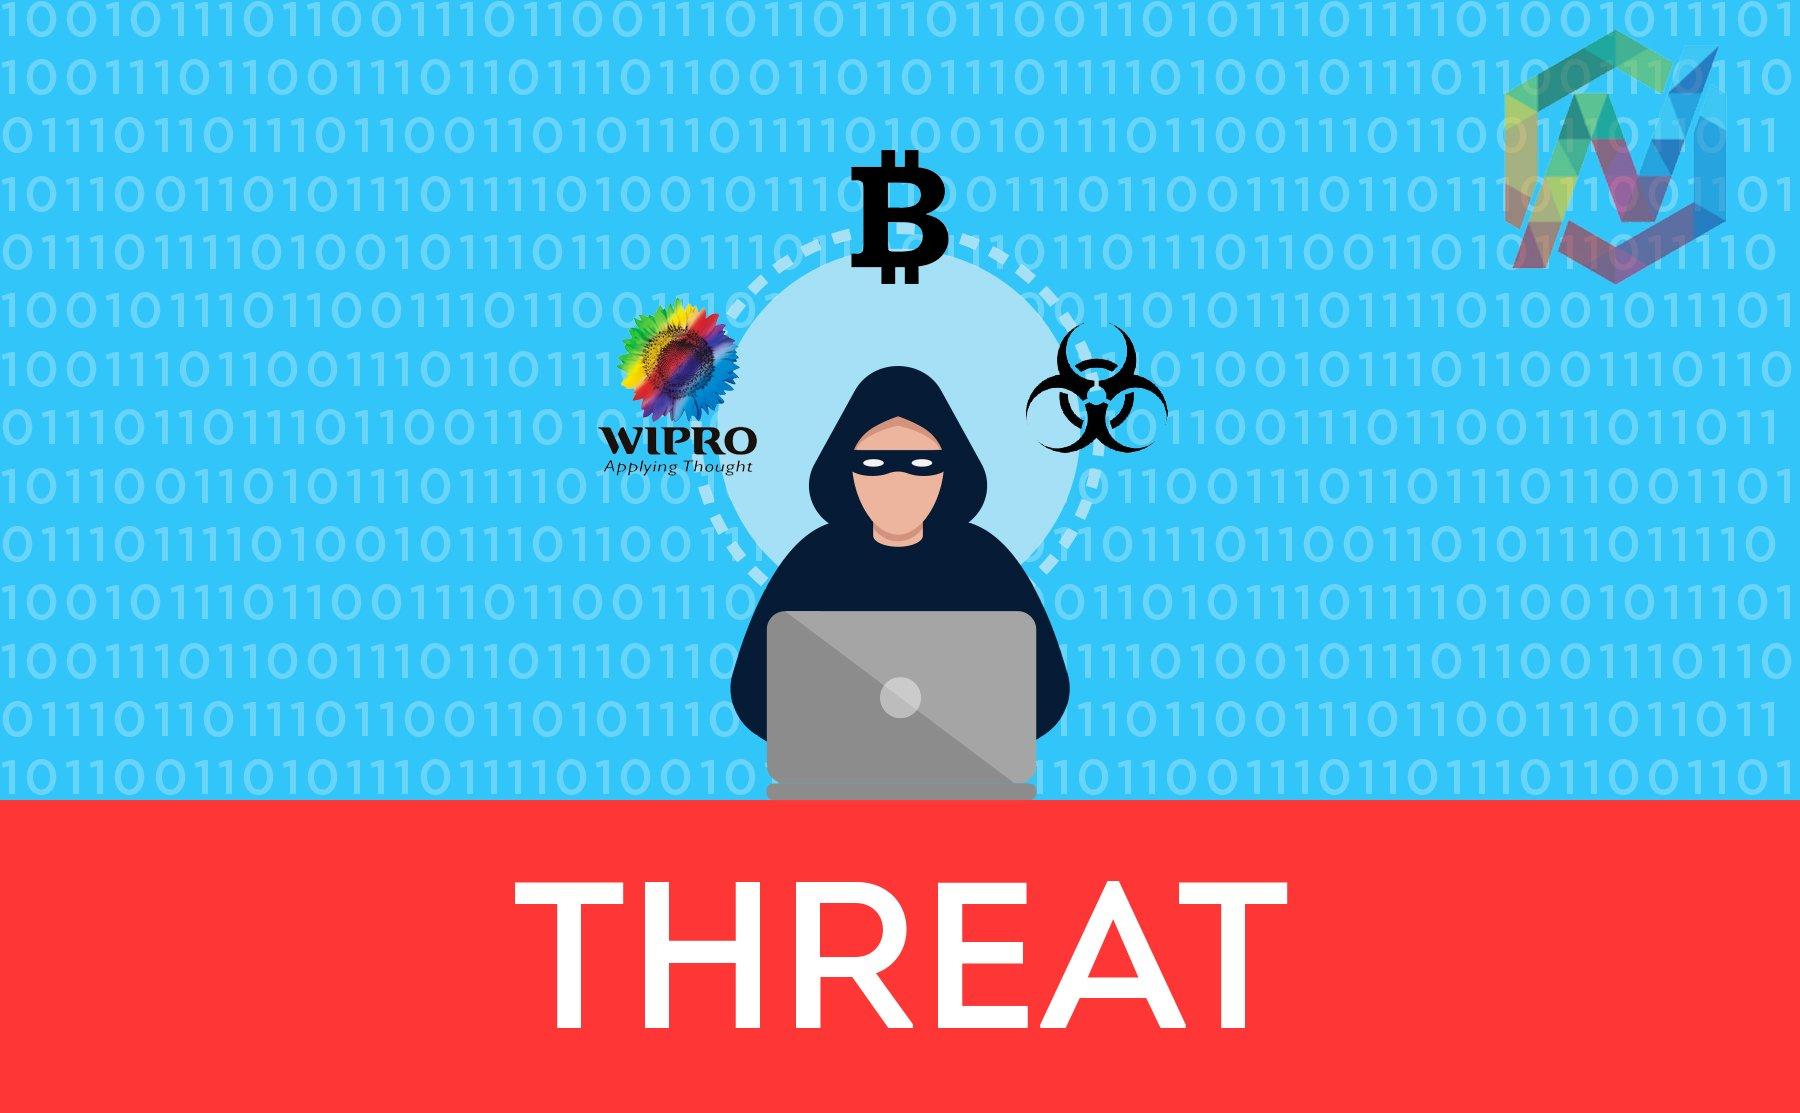 wipro, ricin, ransom, bitcoin